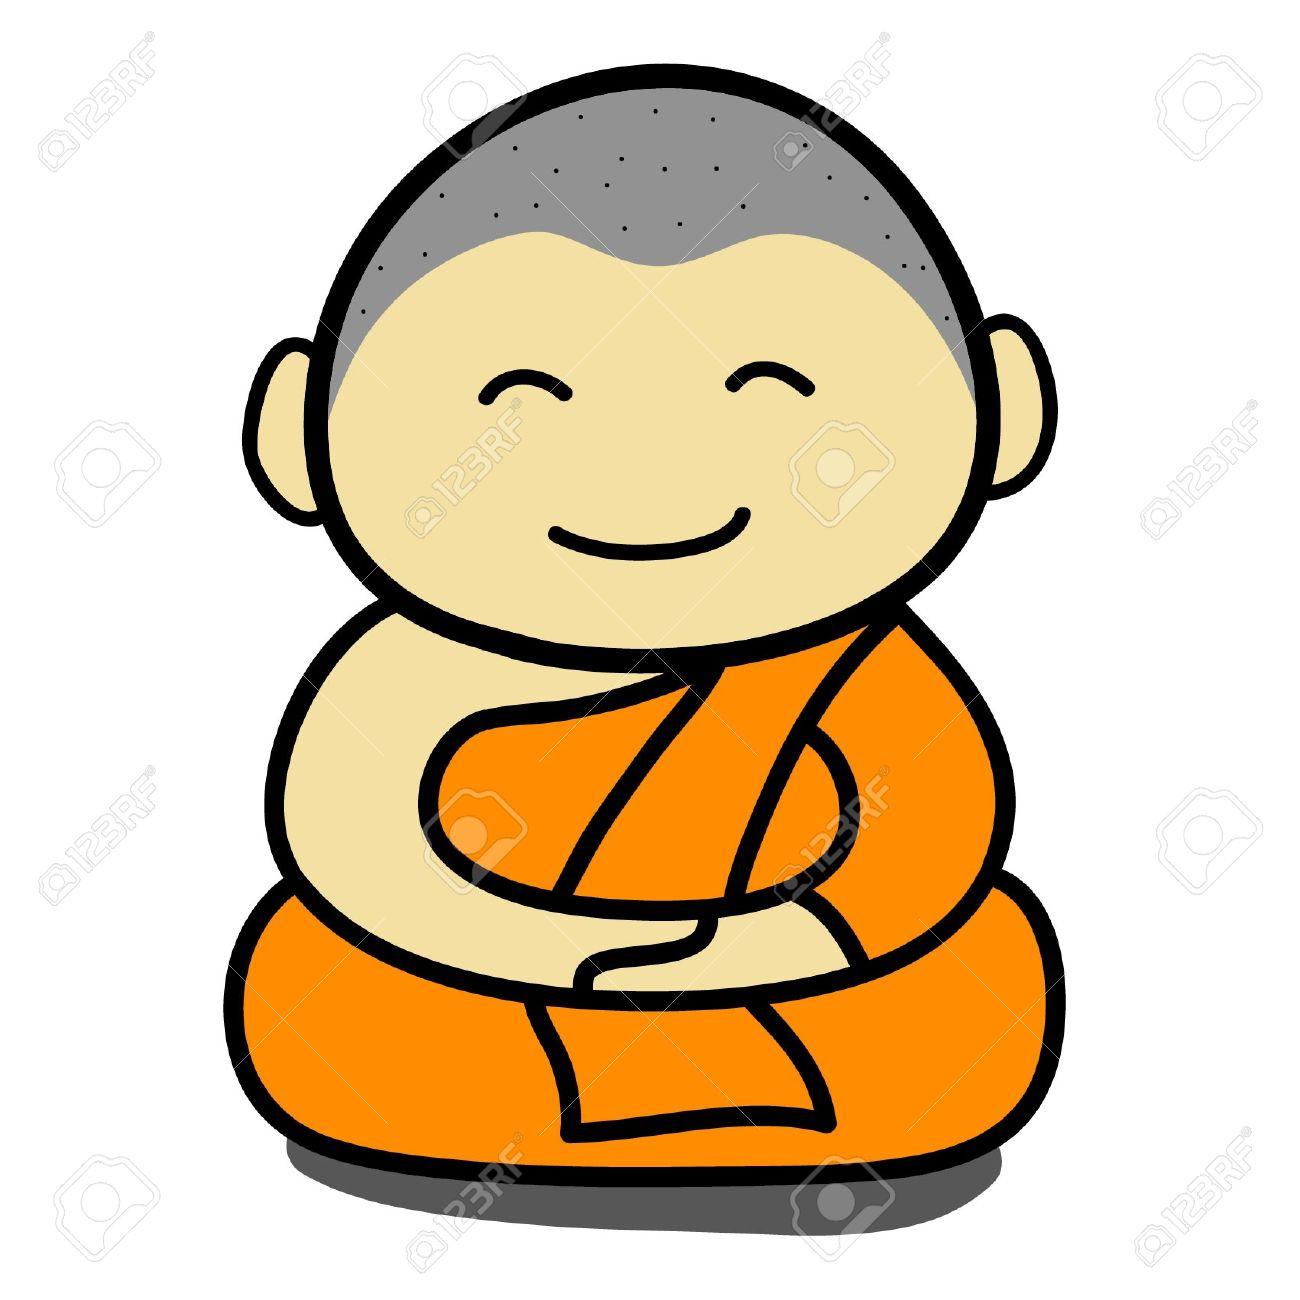 Buddha clipart easy. Cartoon drawing at getdrawings